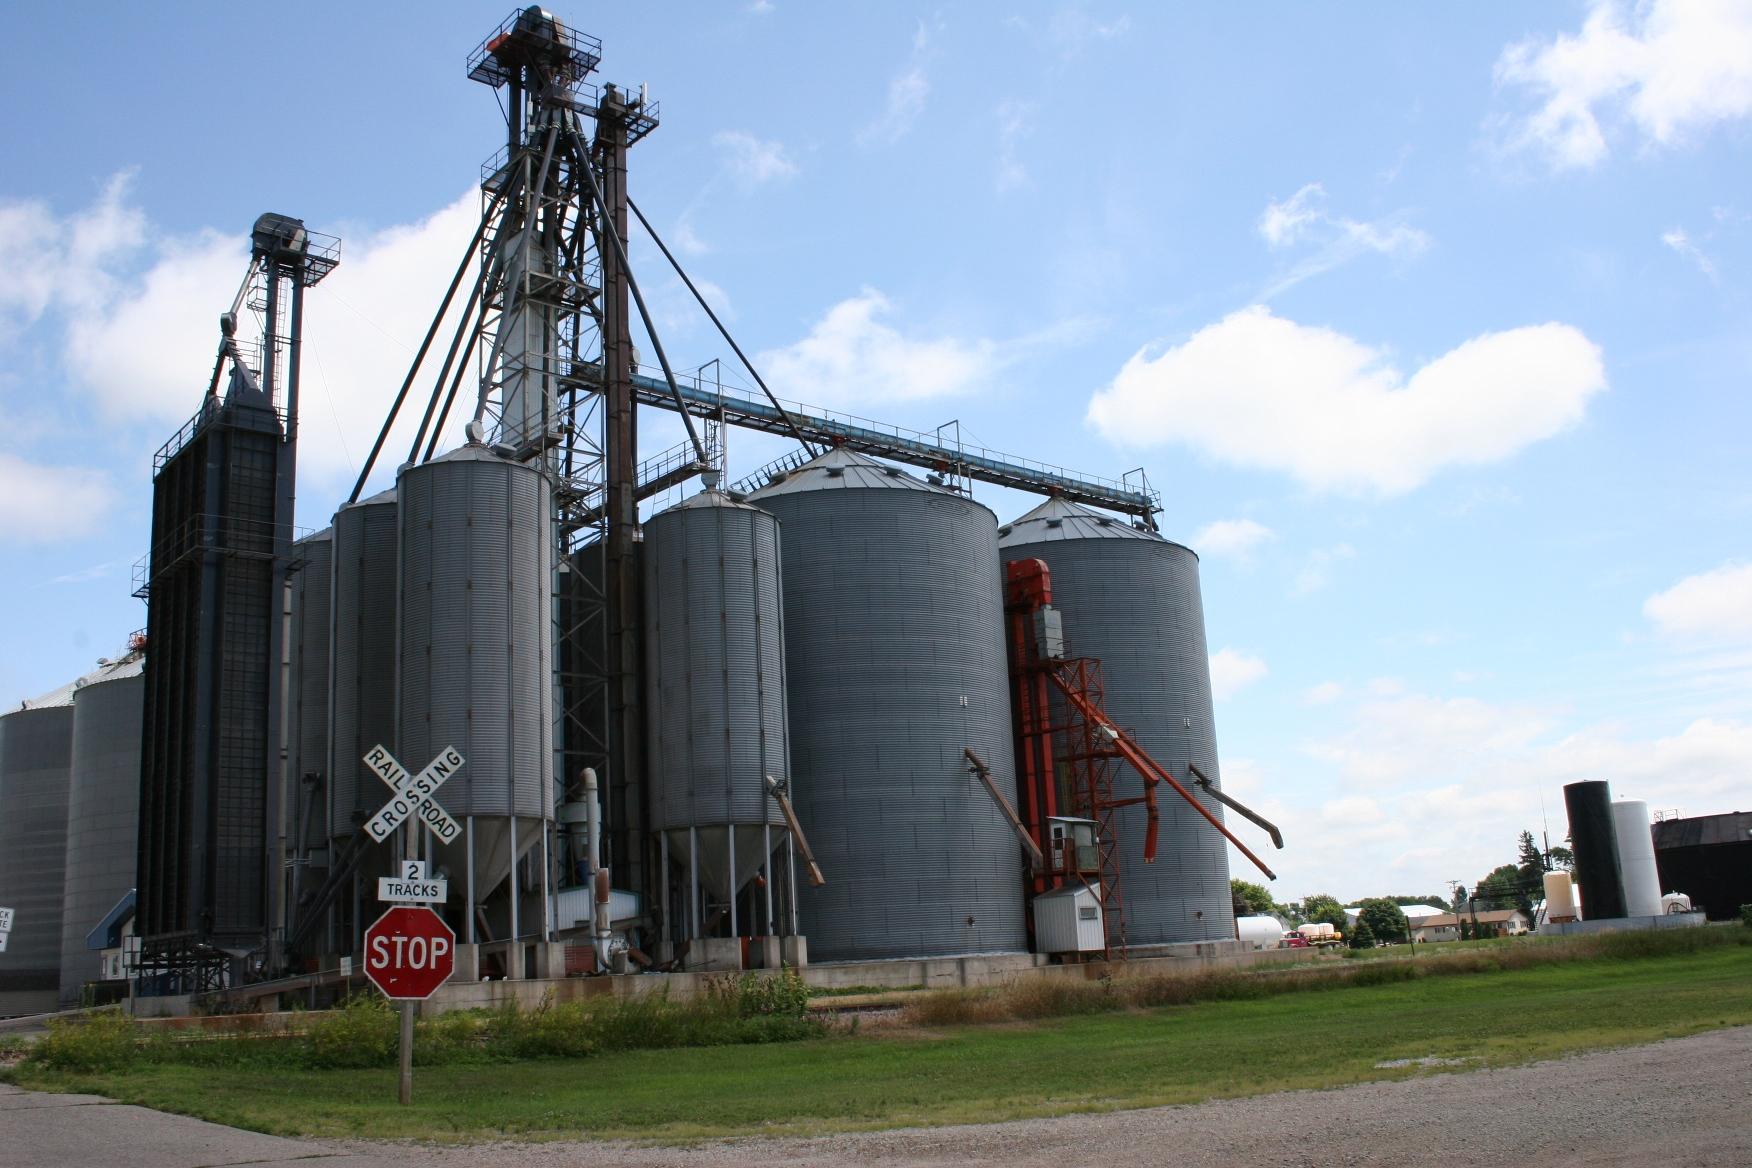 2011 farm-city state essay contest